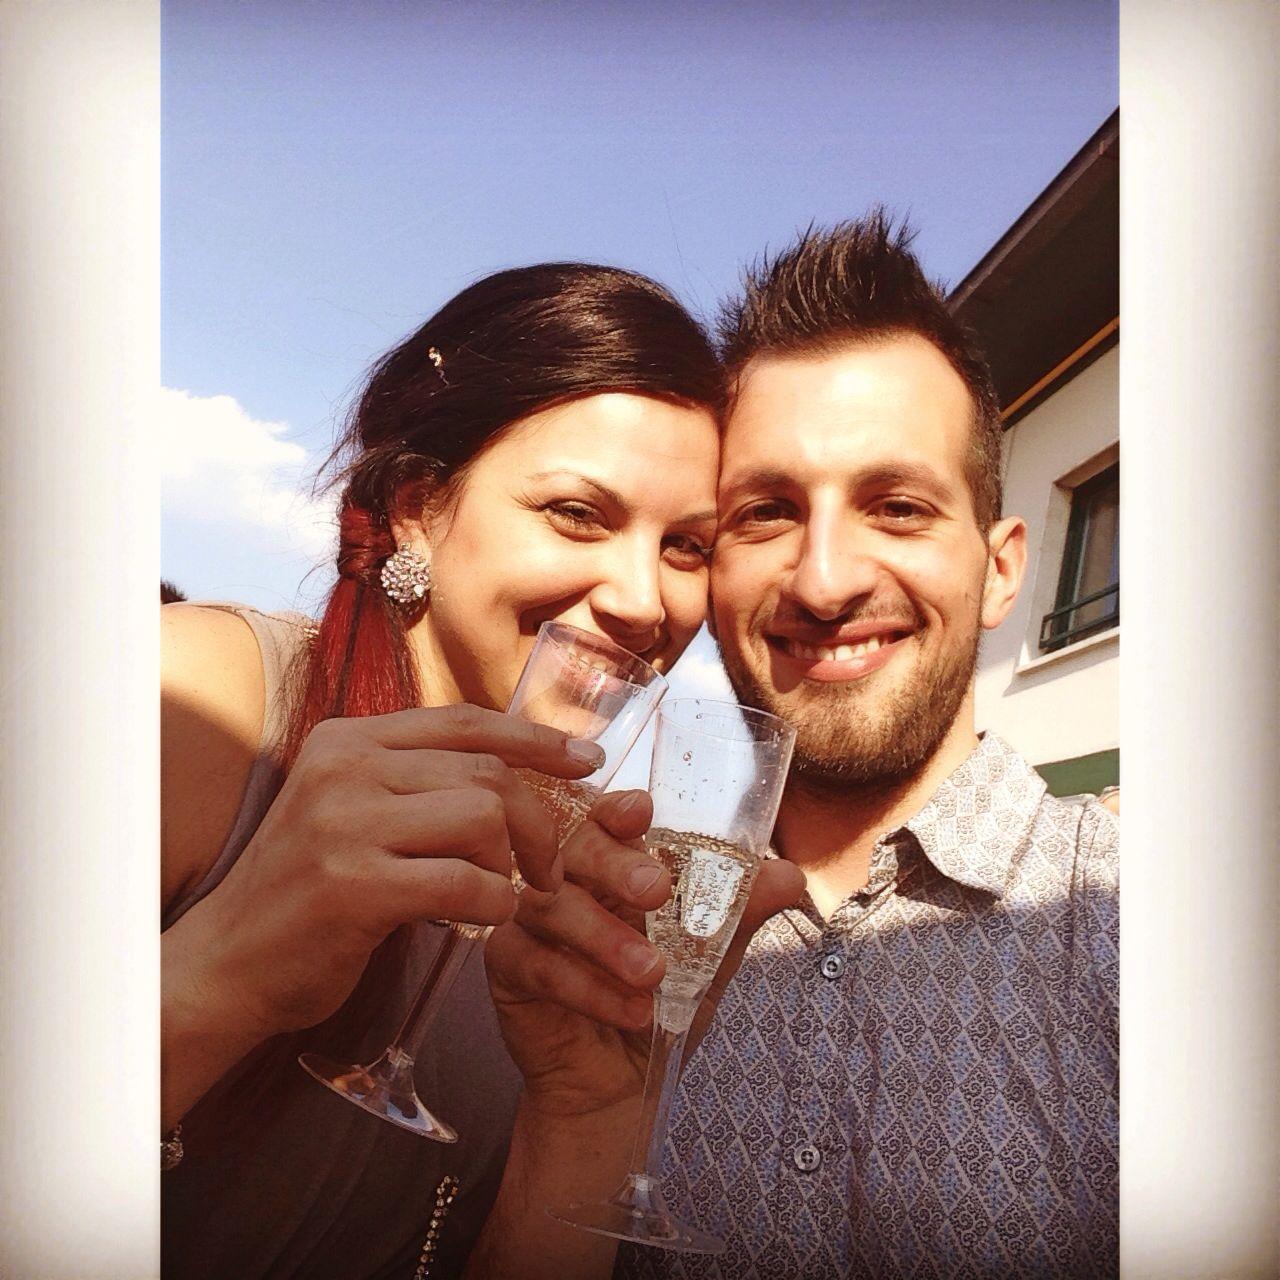 Toast with sparkling wine  #brindisi #marriage #fabiana&luigi #oggiSposi #opera #milan #city #friends #morena #kiss #sun #relax #like #day #tumblr #instagram #foursquare #pinterest #twitter at Opera, Milano